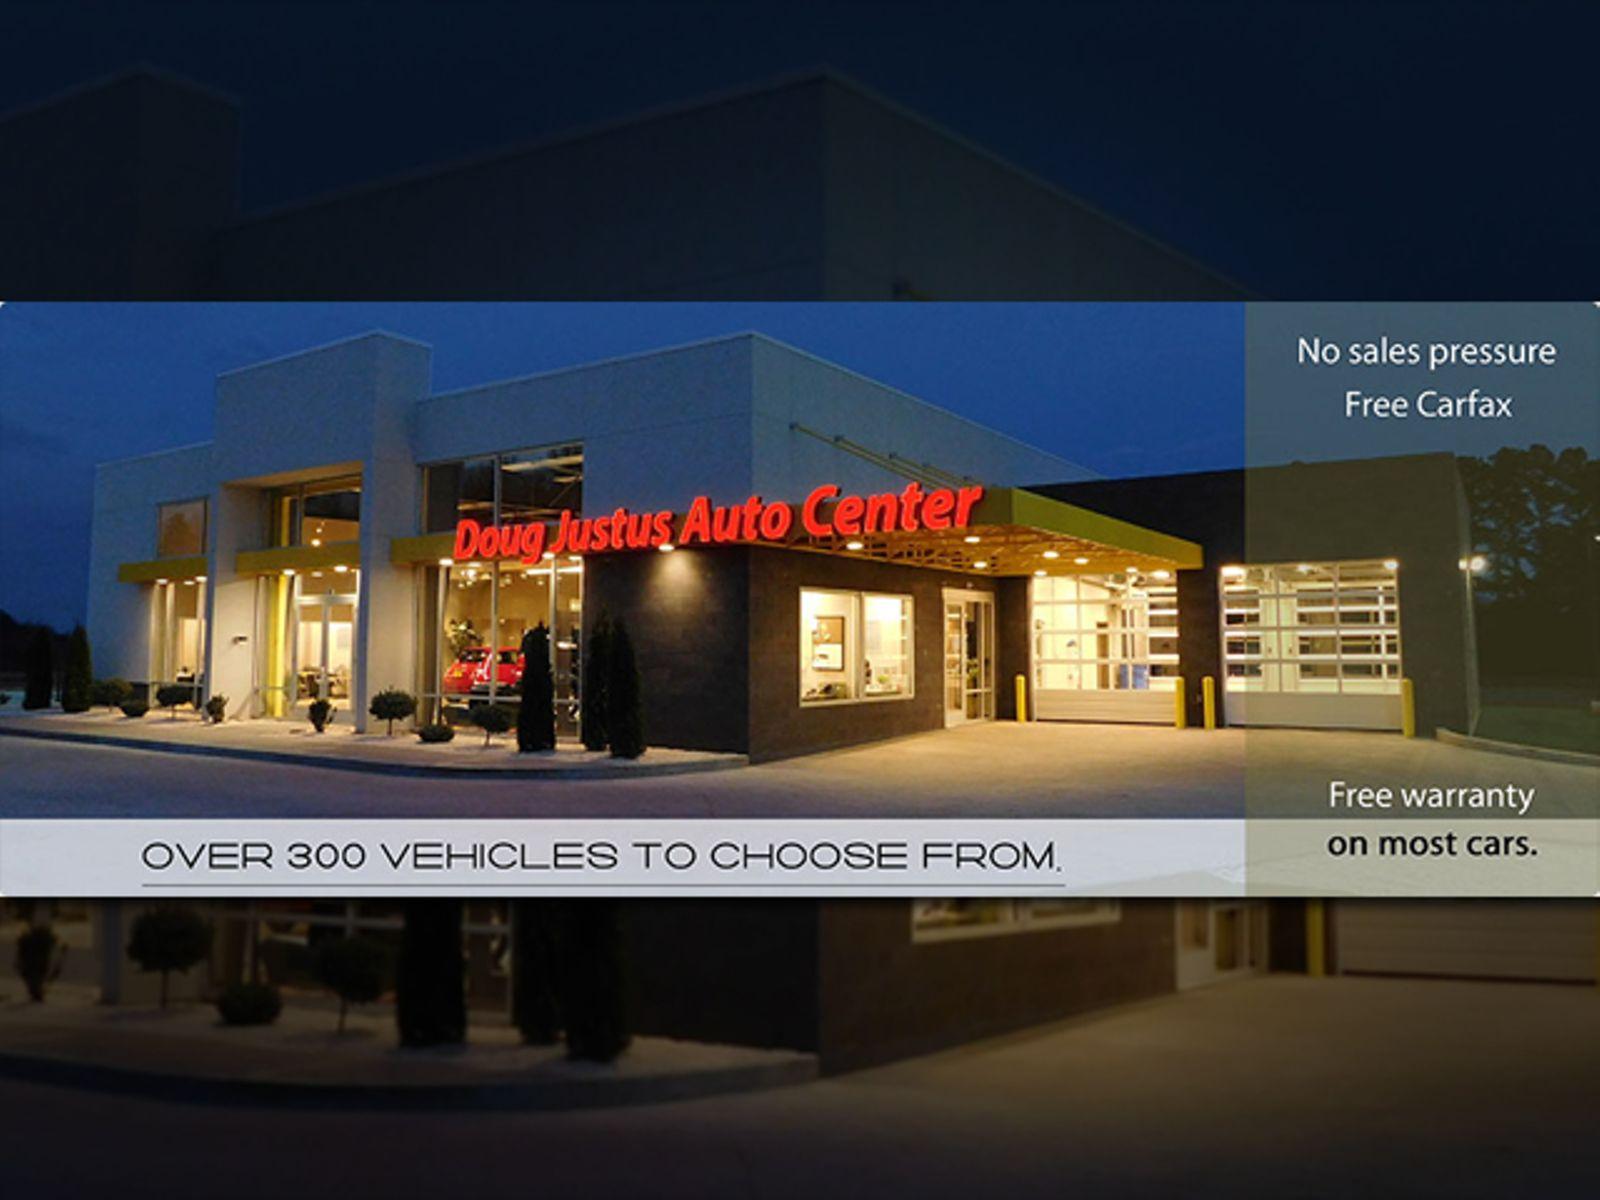 ... 2014 Chevrolet Spark LT city TN Doug Justus Auto Center Inc in Airport Motor Mile ... & 2014 Chevrolet Spark LT city TN Doug Justus Auto Center Inc azcodes.com